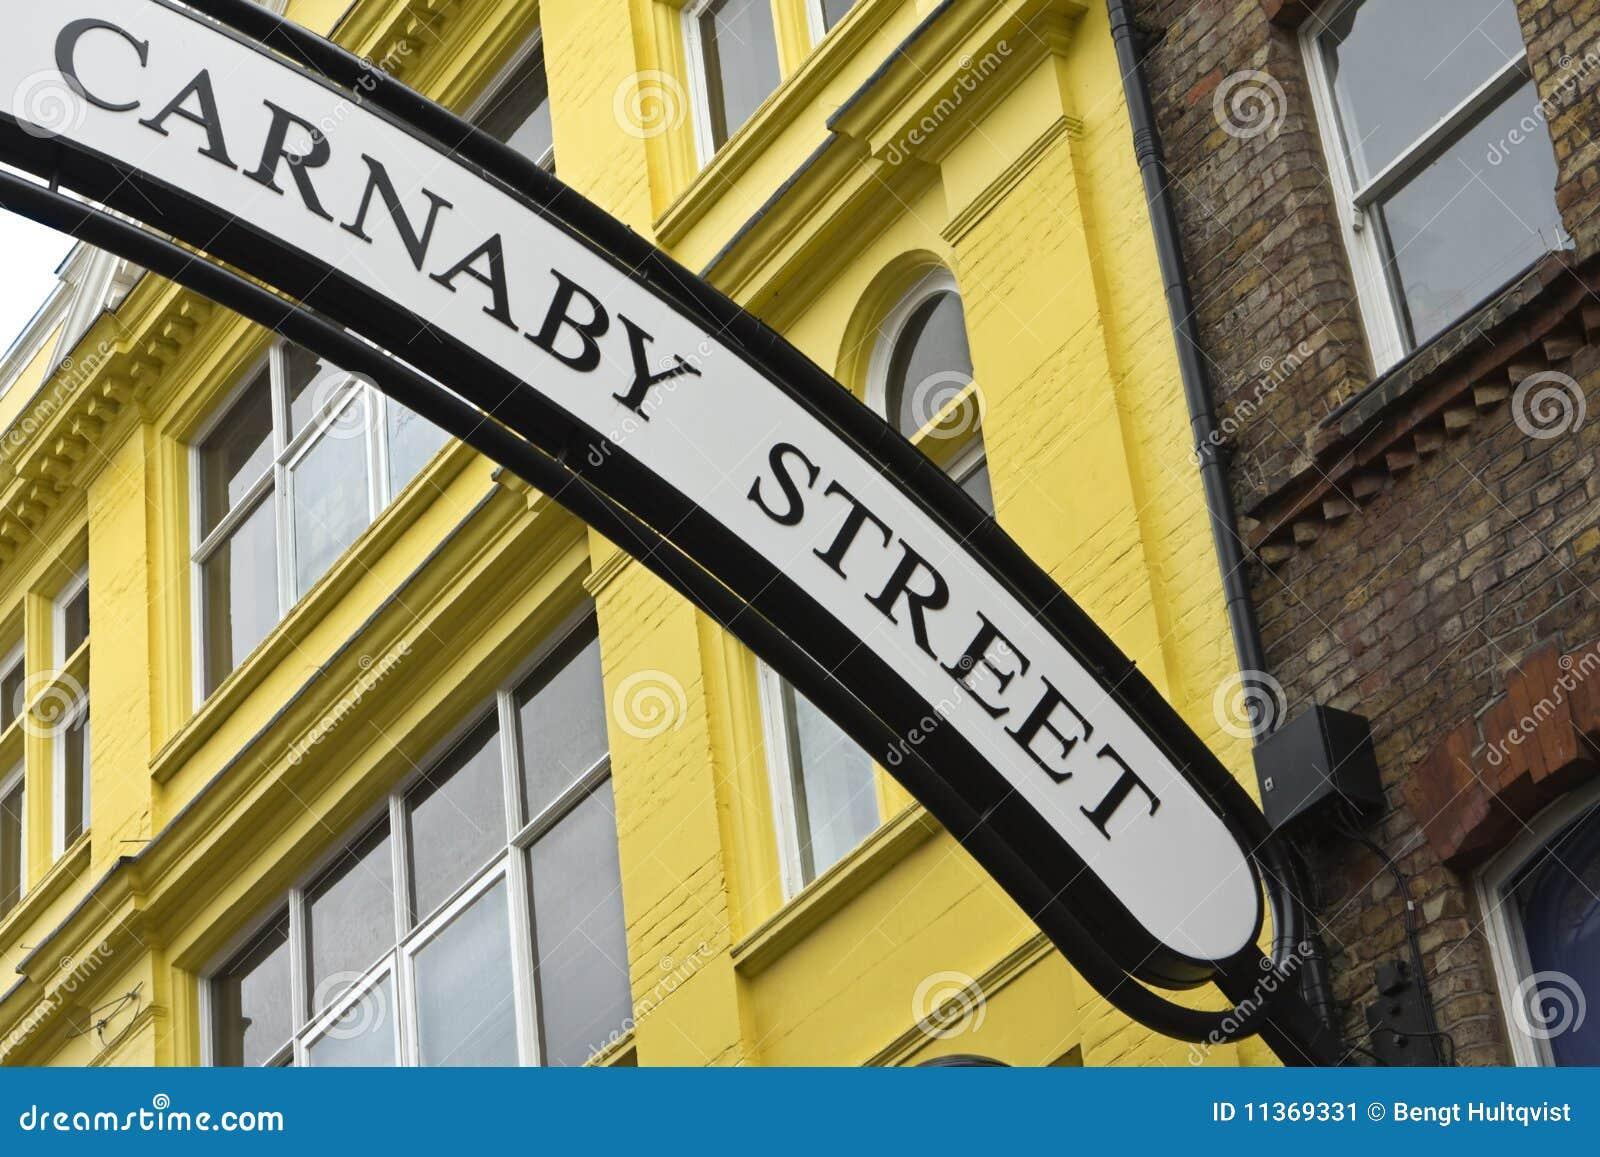 Carnaby街道